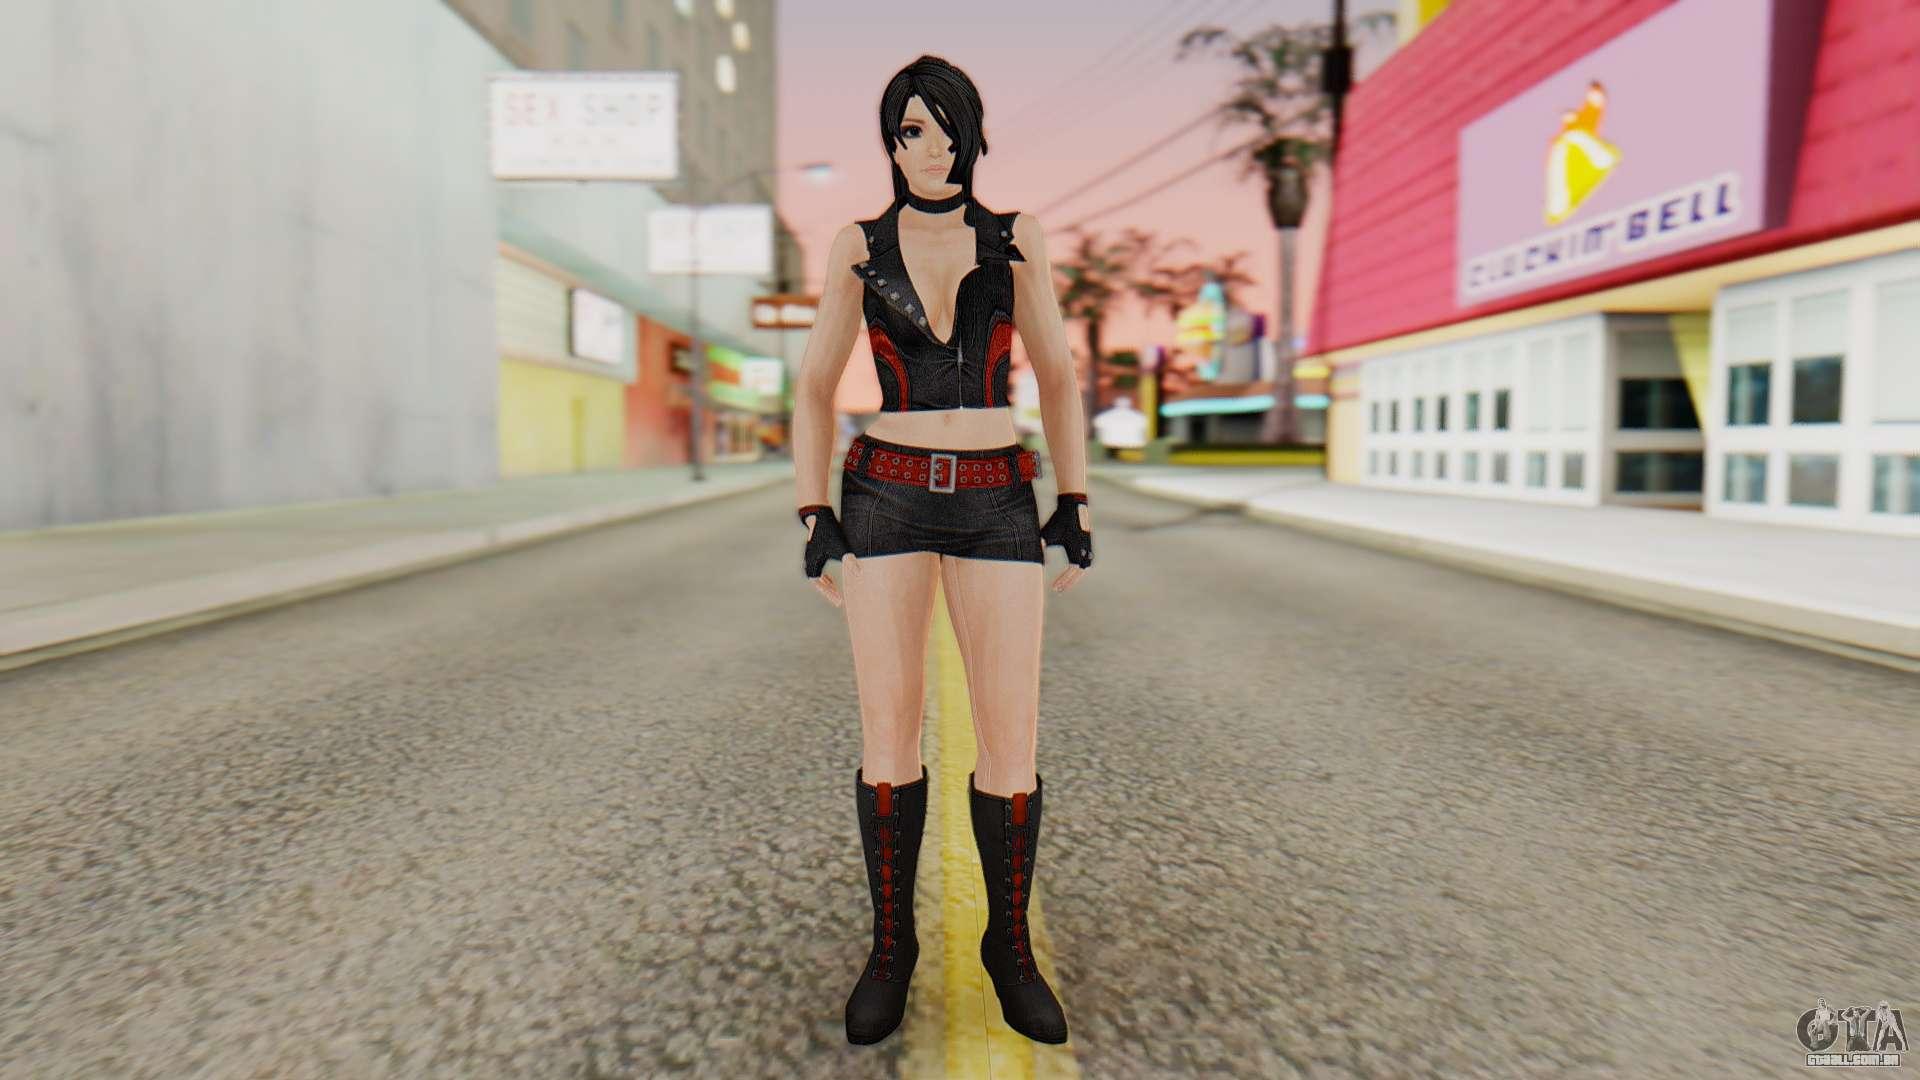 Katarina  The Sexy Blade Skin Control  GTA5Modscom